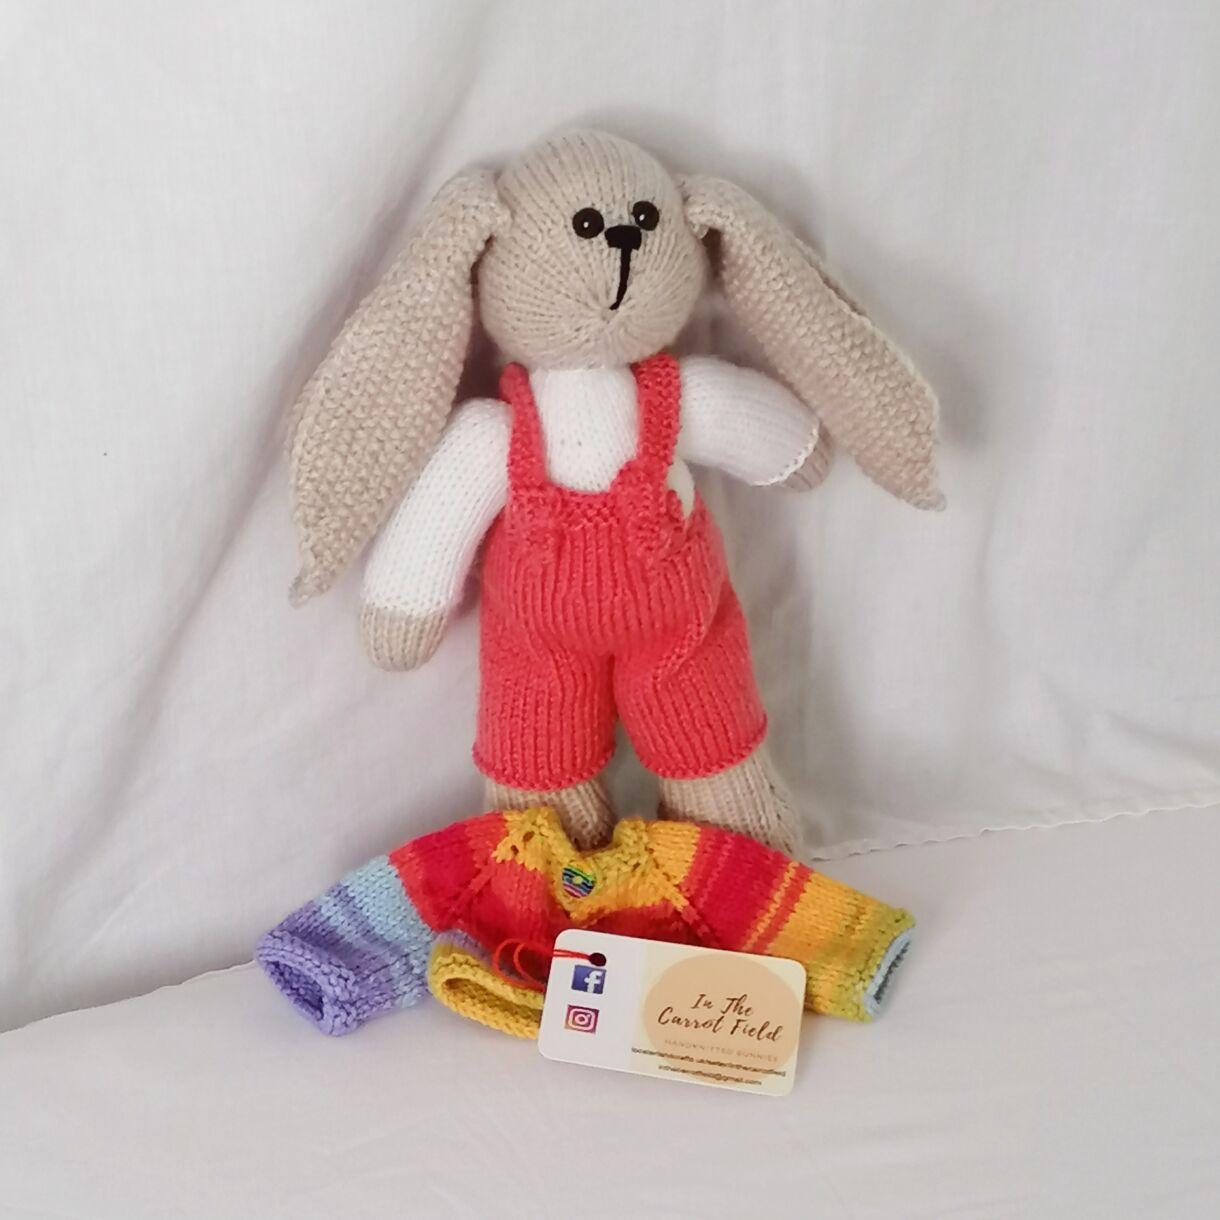 handknitted-rainbow-bunny-unique-gift-orange-front-no-jacket